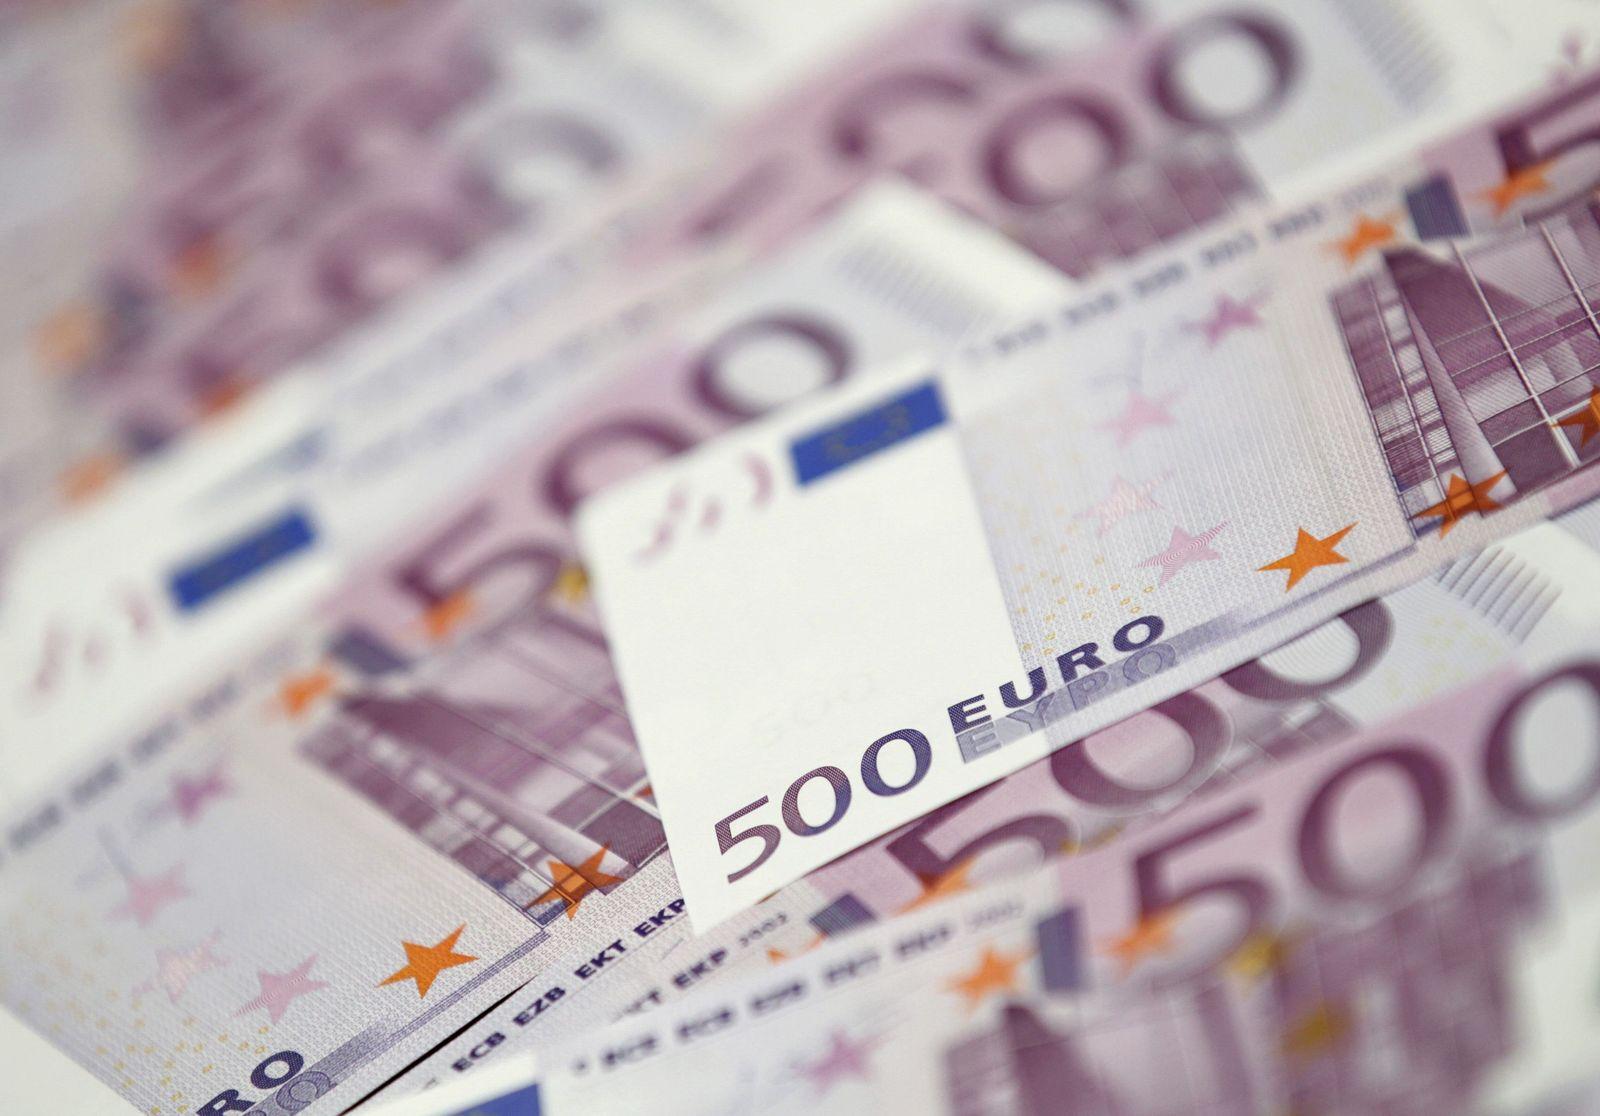 EUROPE-FRAUD/BANKNOTES